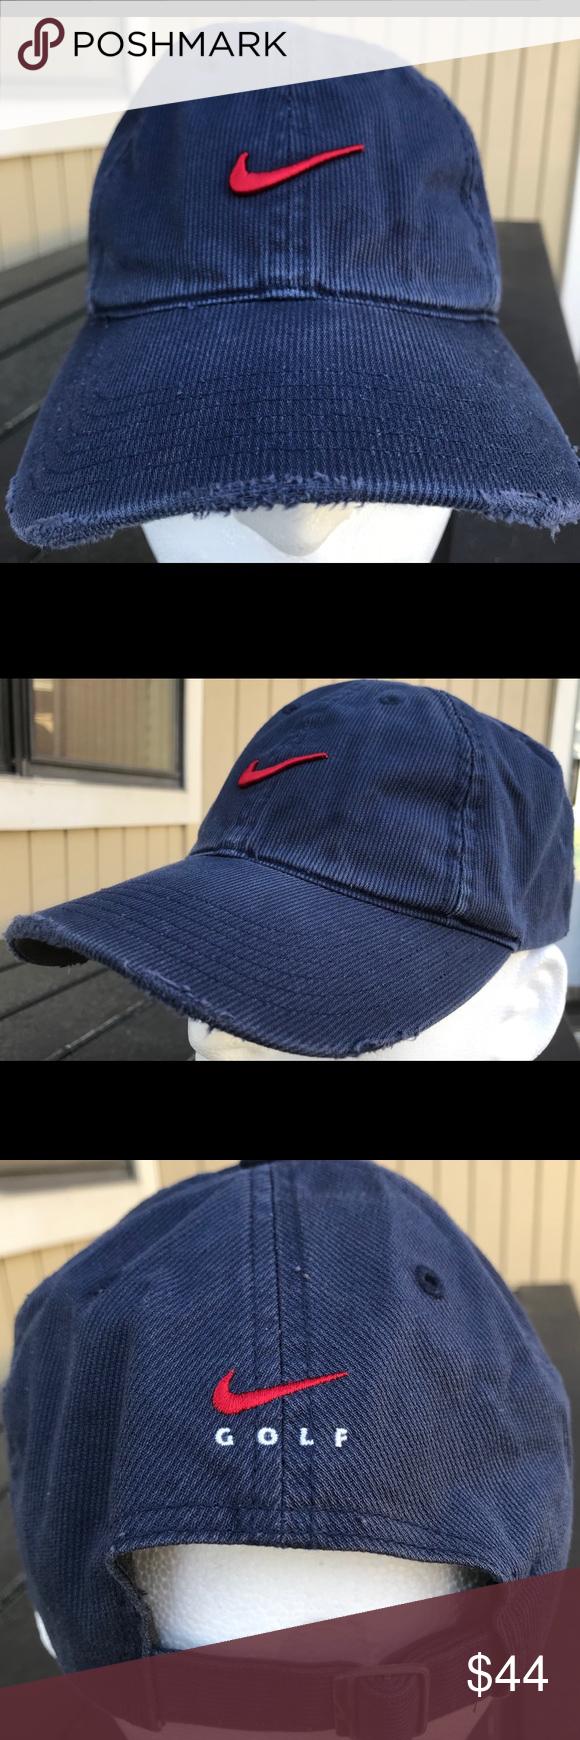 Nike Golf Hat Vintage Corduroy Navy Blue Strapback Hats Vintage Nike Golf Hat Golf Hats